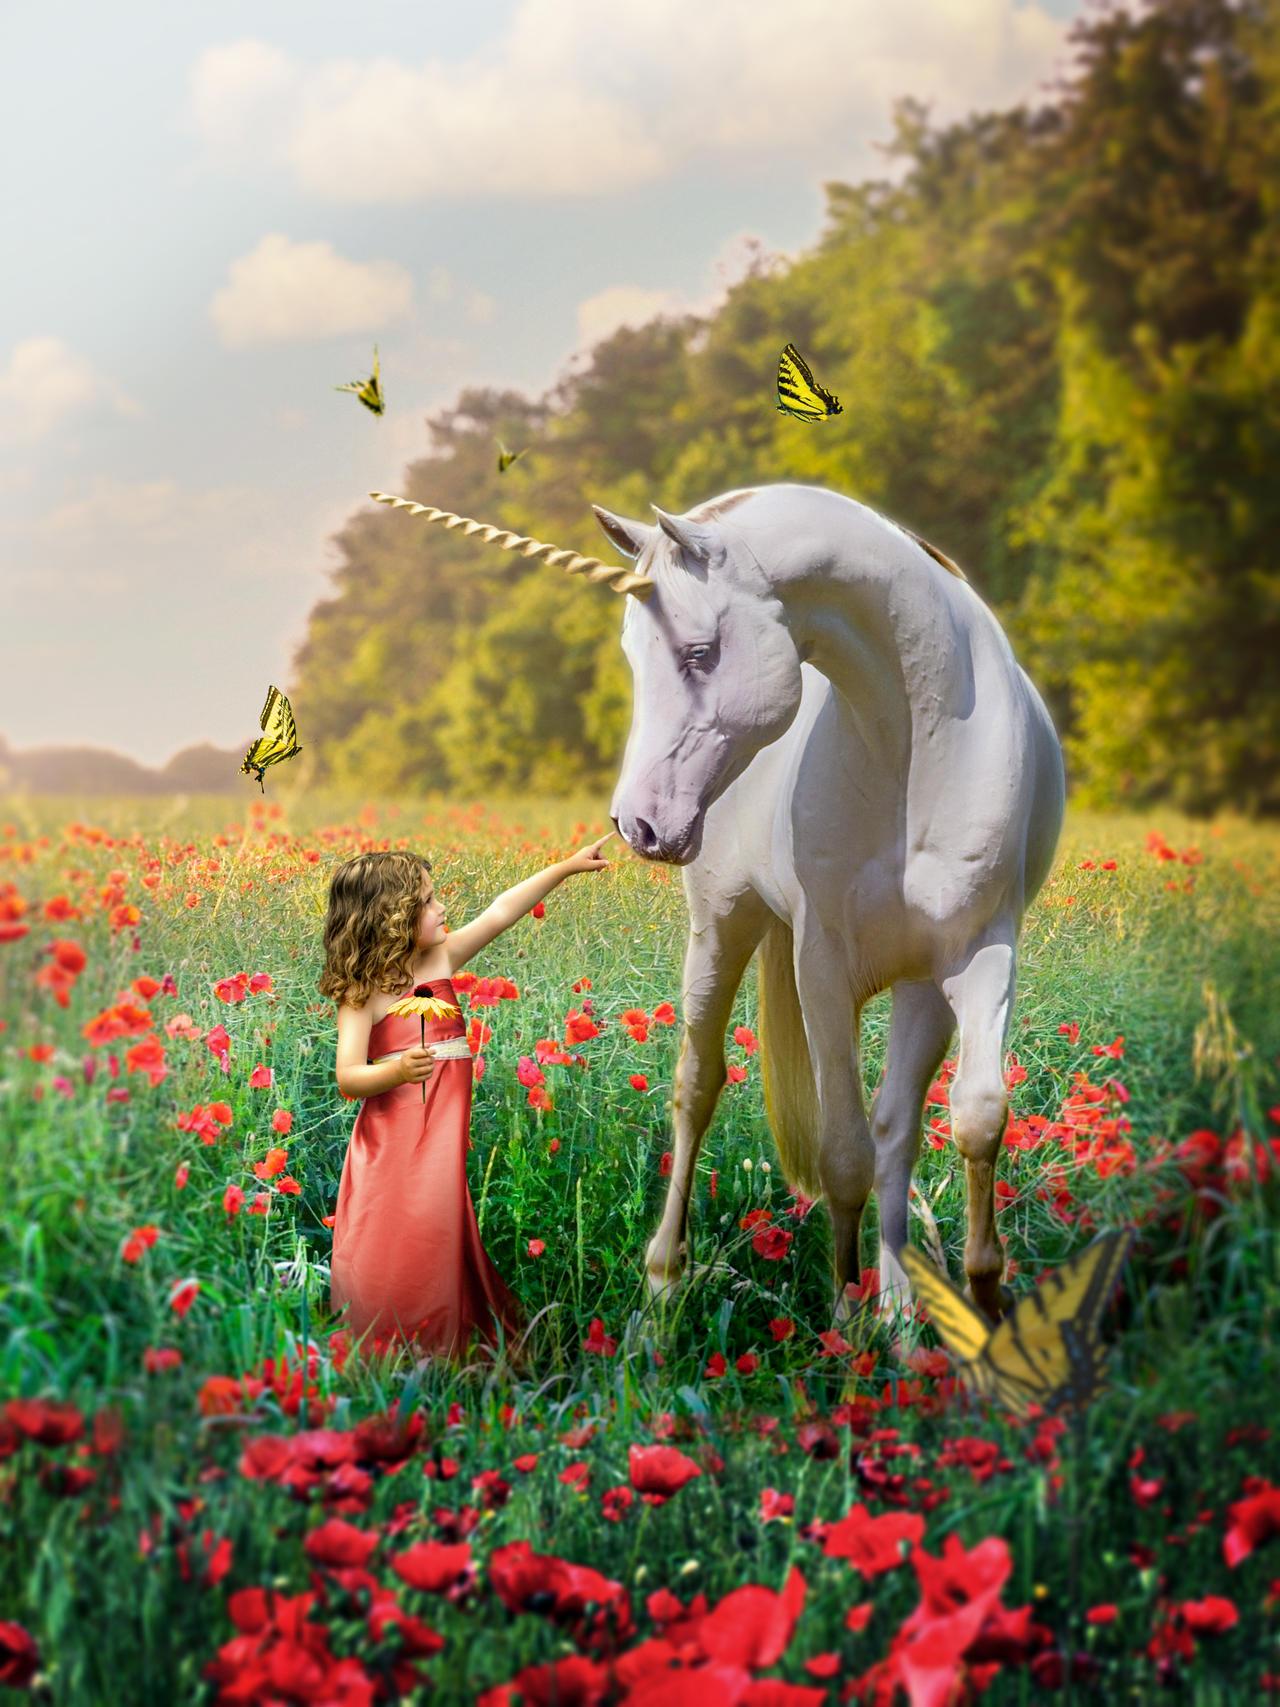 Child Unicorn